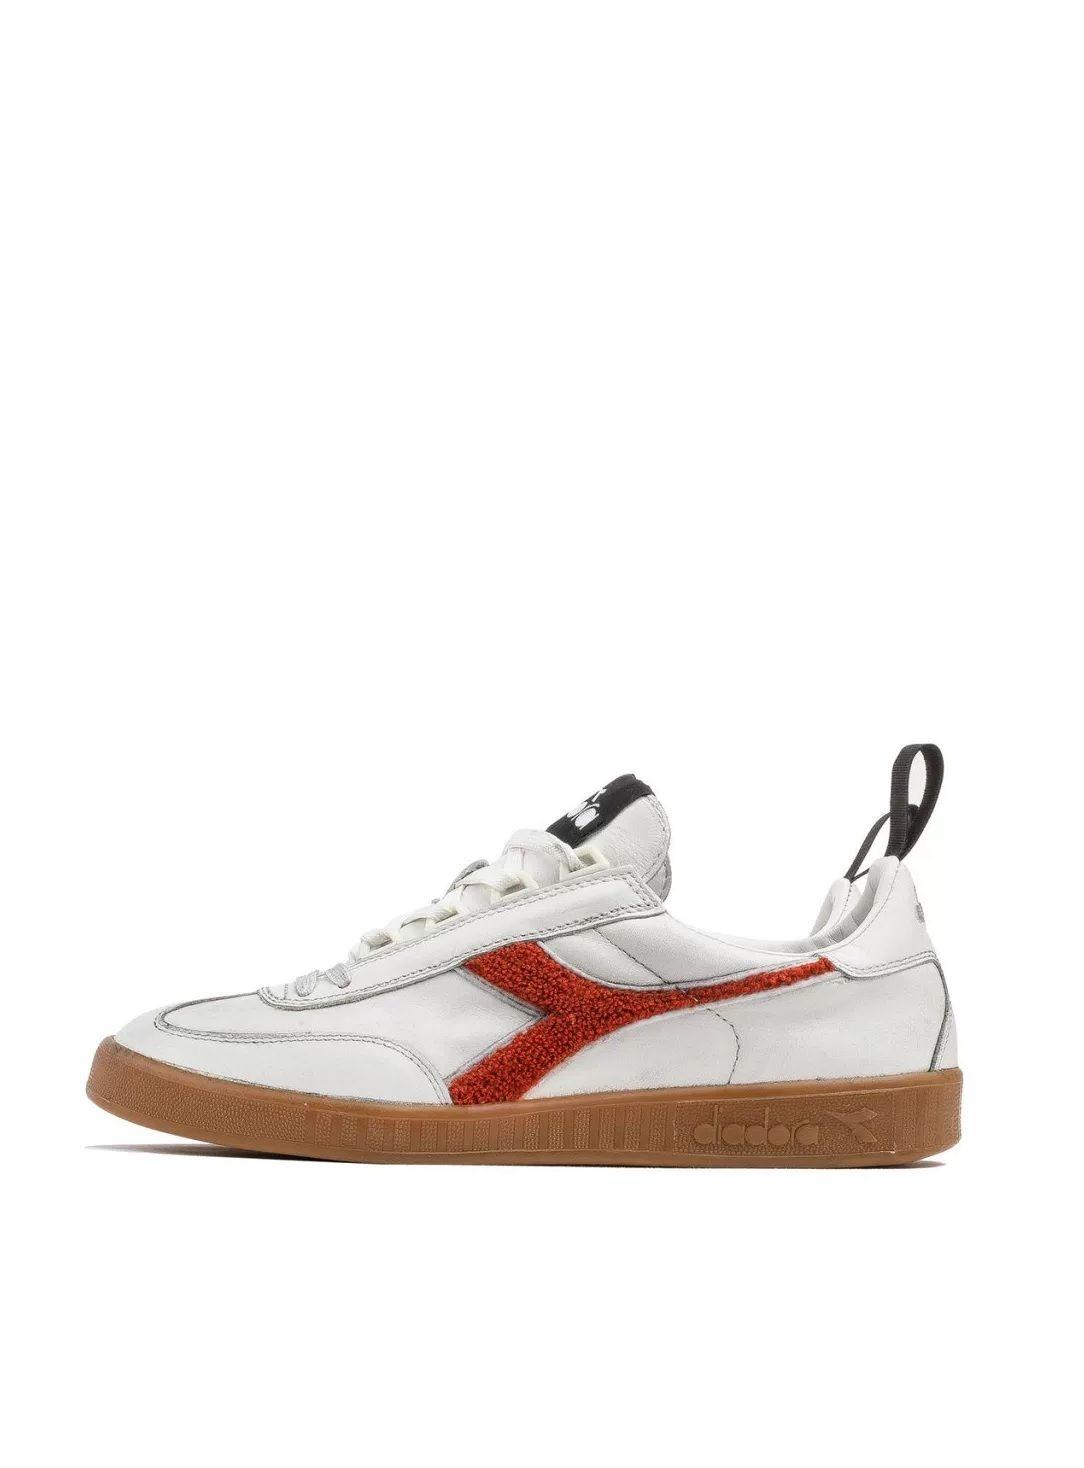 e9a49cc837 Diadora B Originals | Hot Kicks ! in 2019 | Diadora sneakers ...